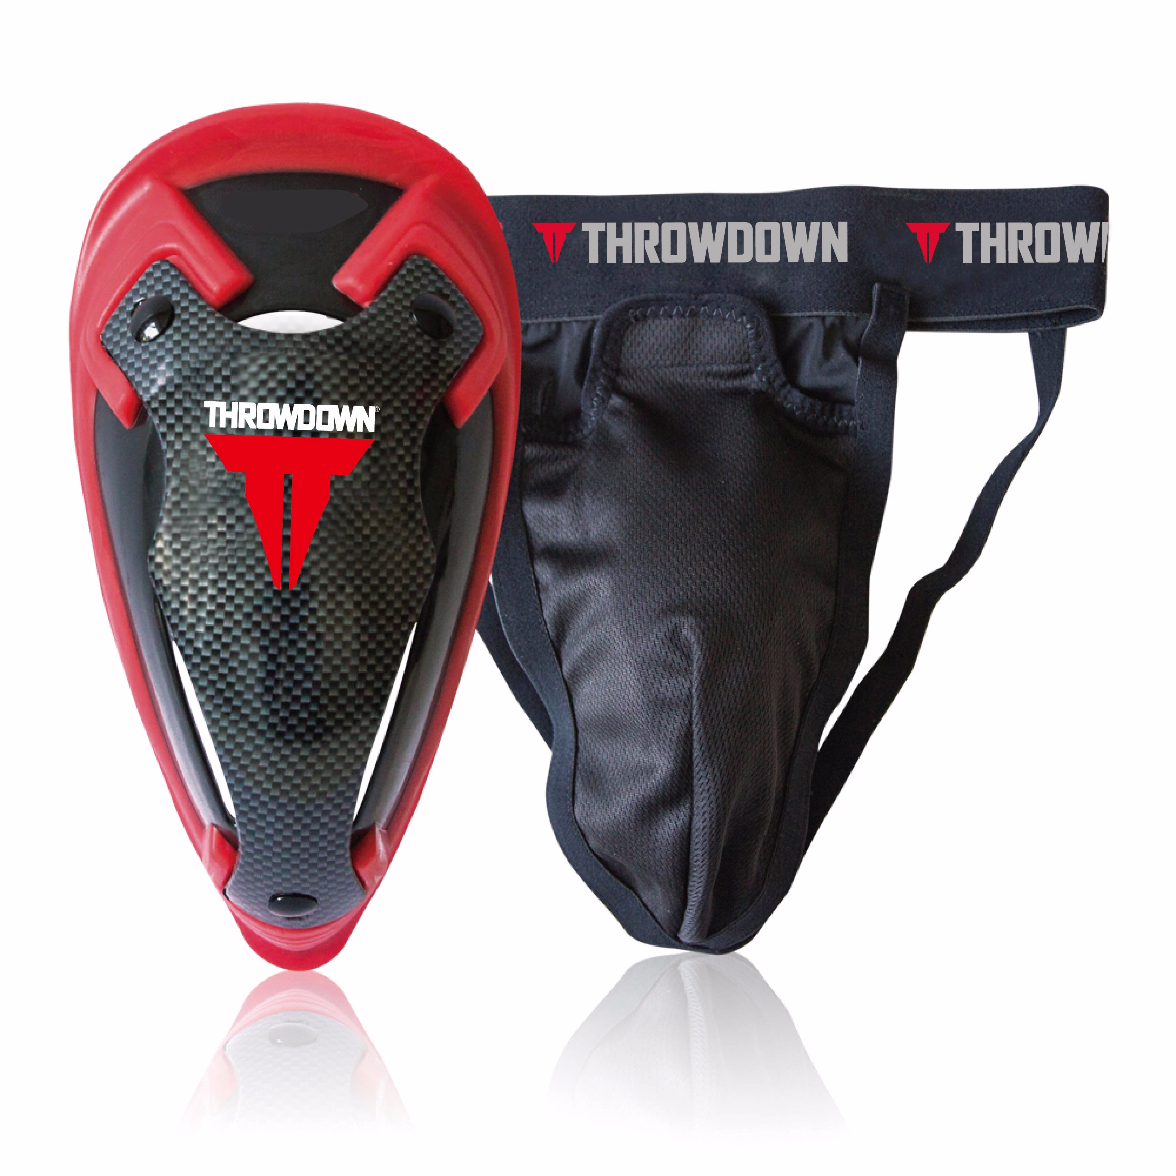 Throwdown Tiefschutz Max-Pro Groin Guard